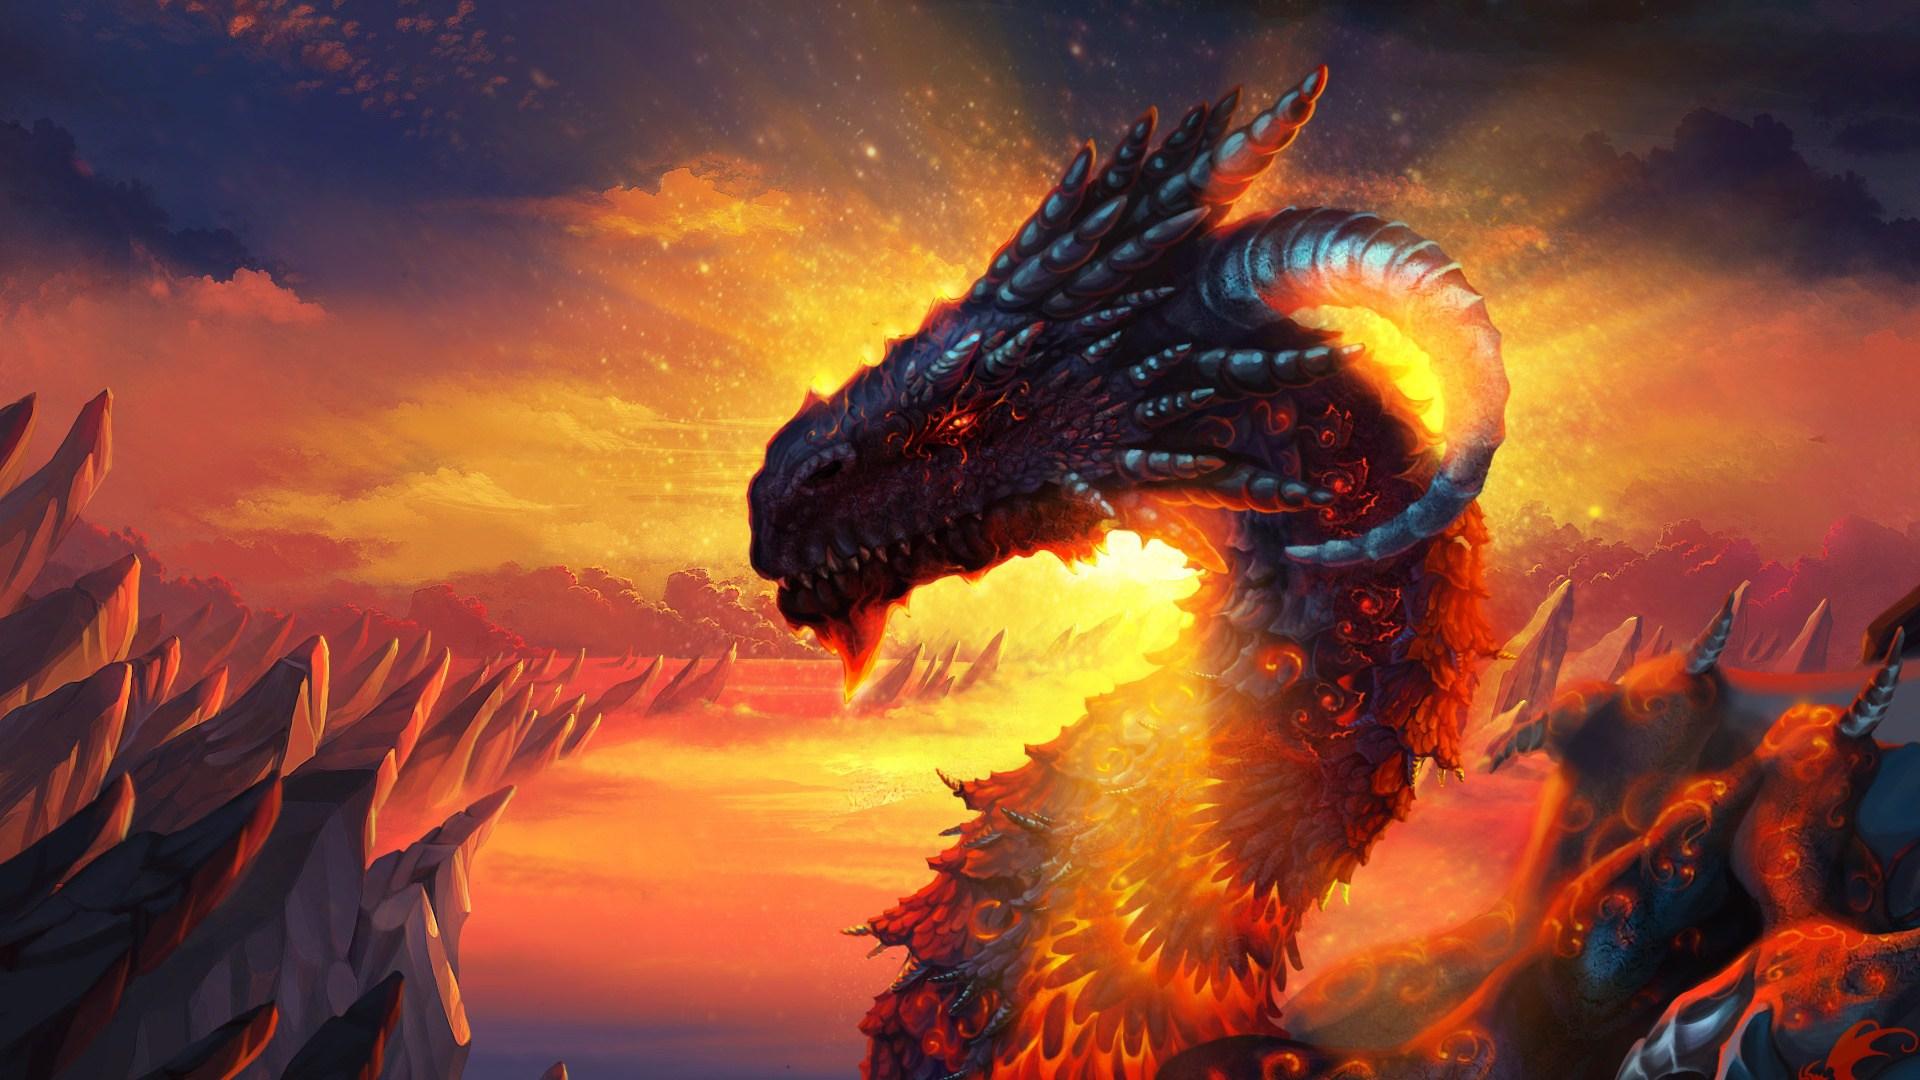 Fire Dragon Hd Wallpaper Sf Wallpaper